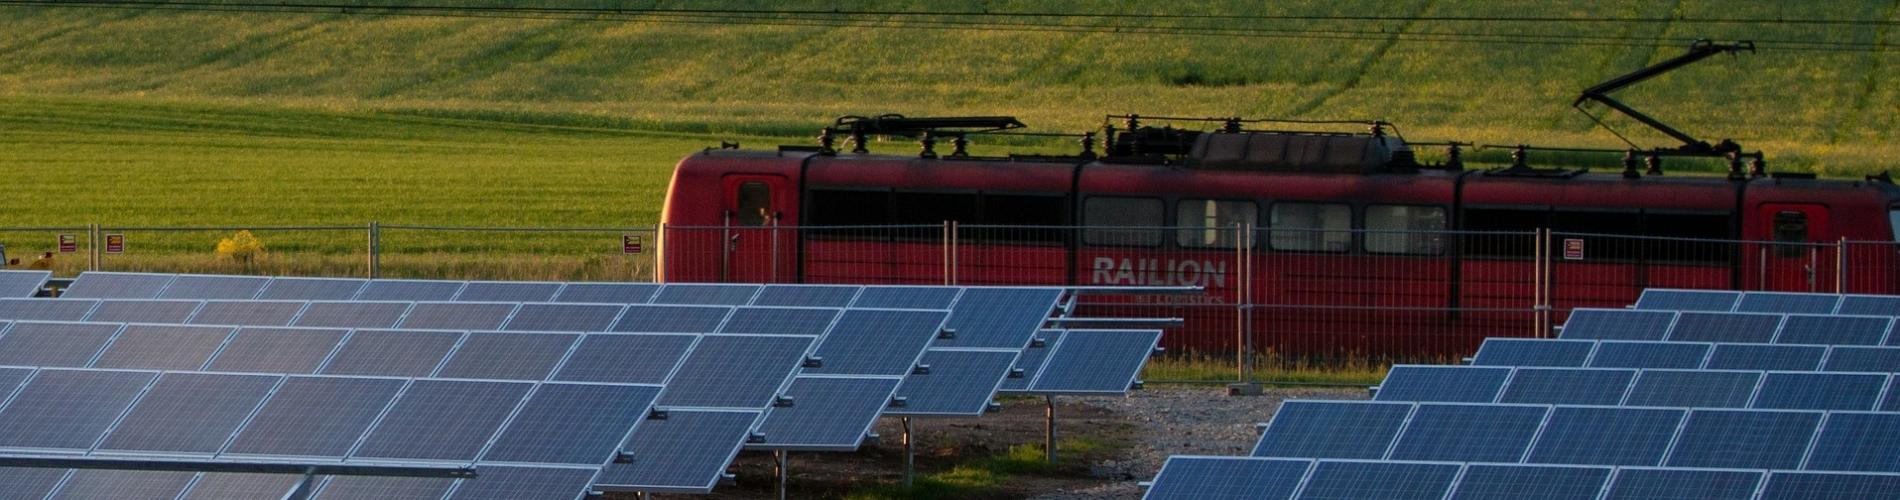 Solardoktor - Zug und Panele